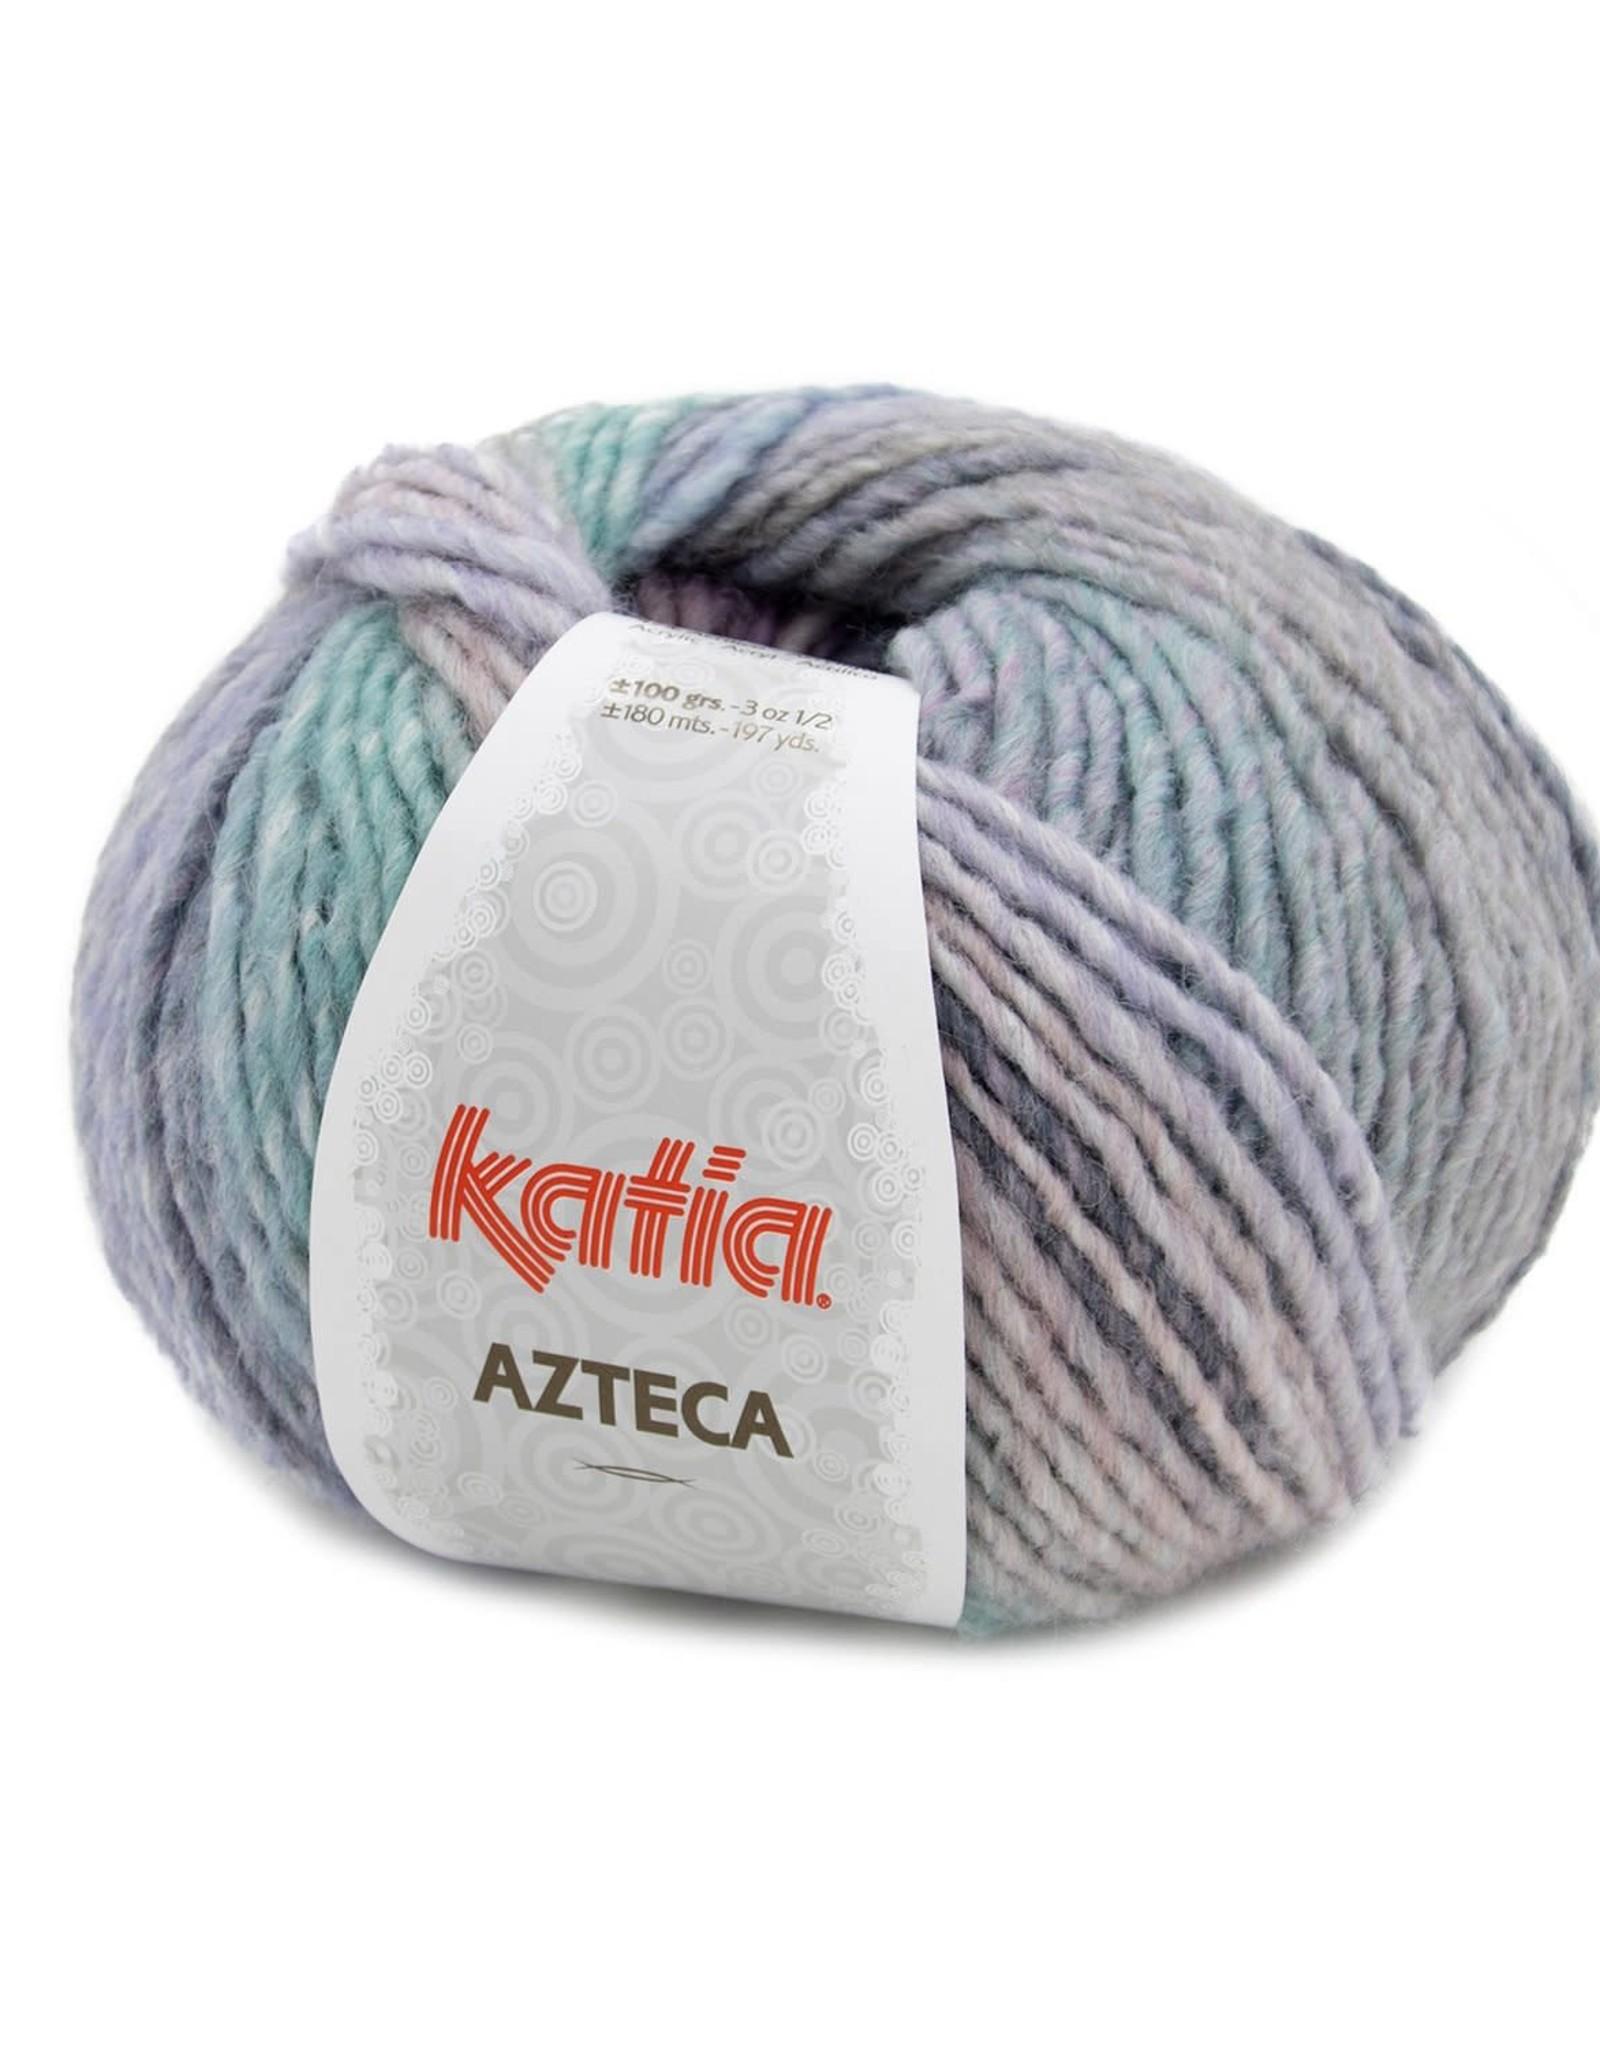 Katia Katia Azteca 7878 Pastel-Paars-Groen